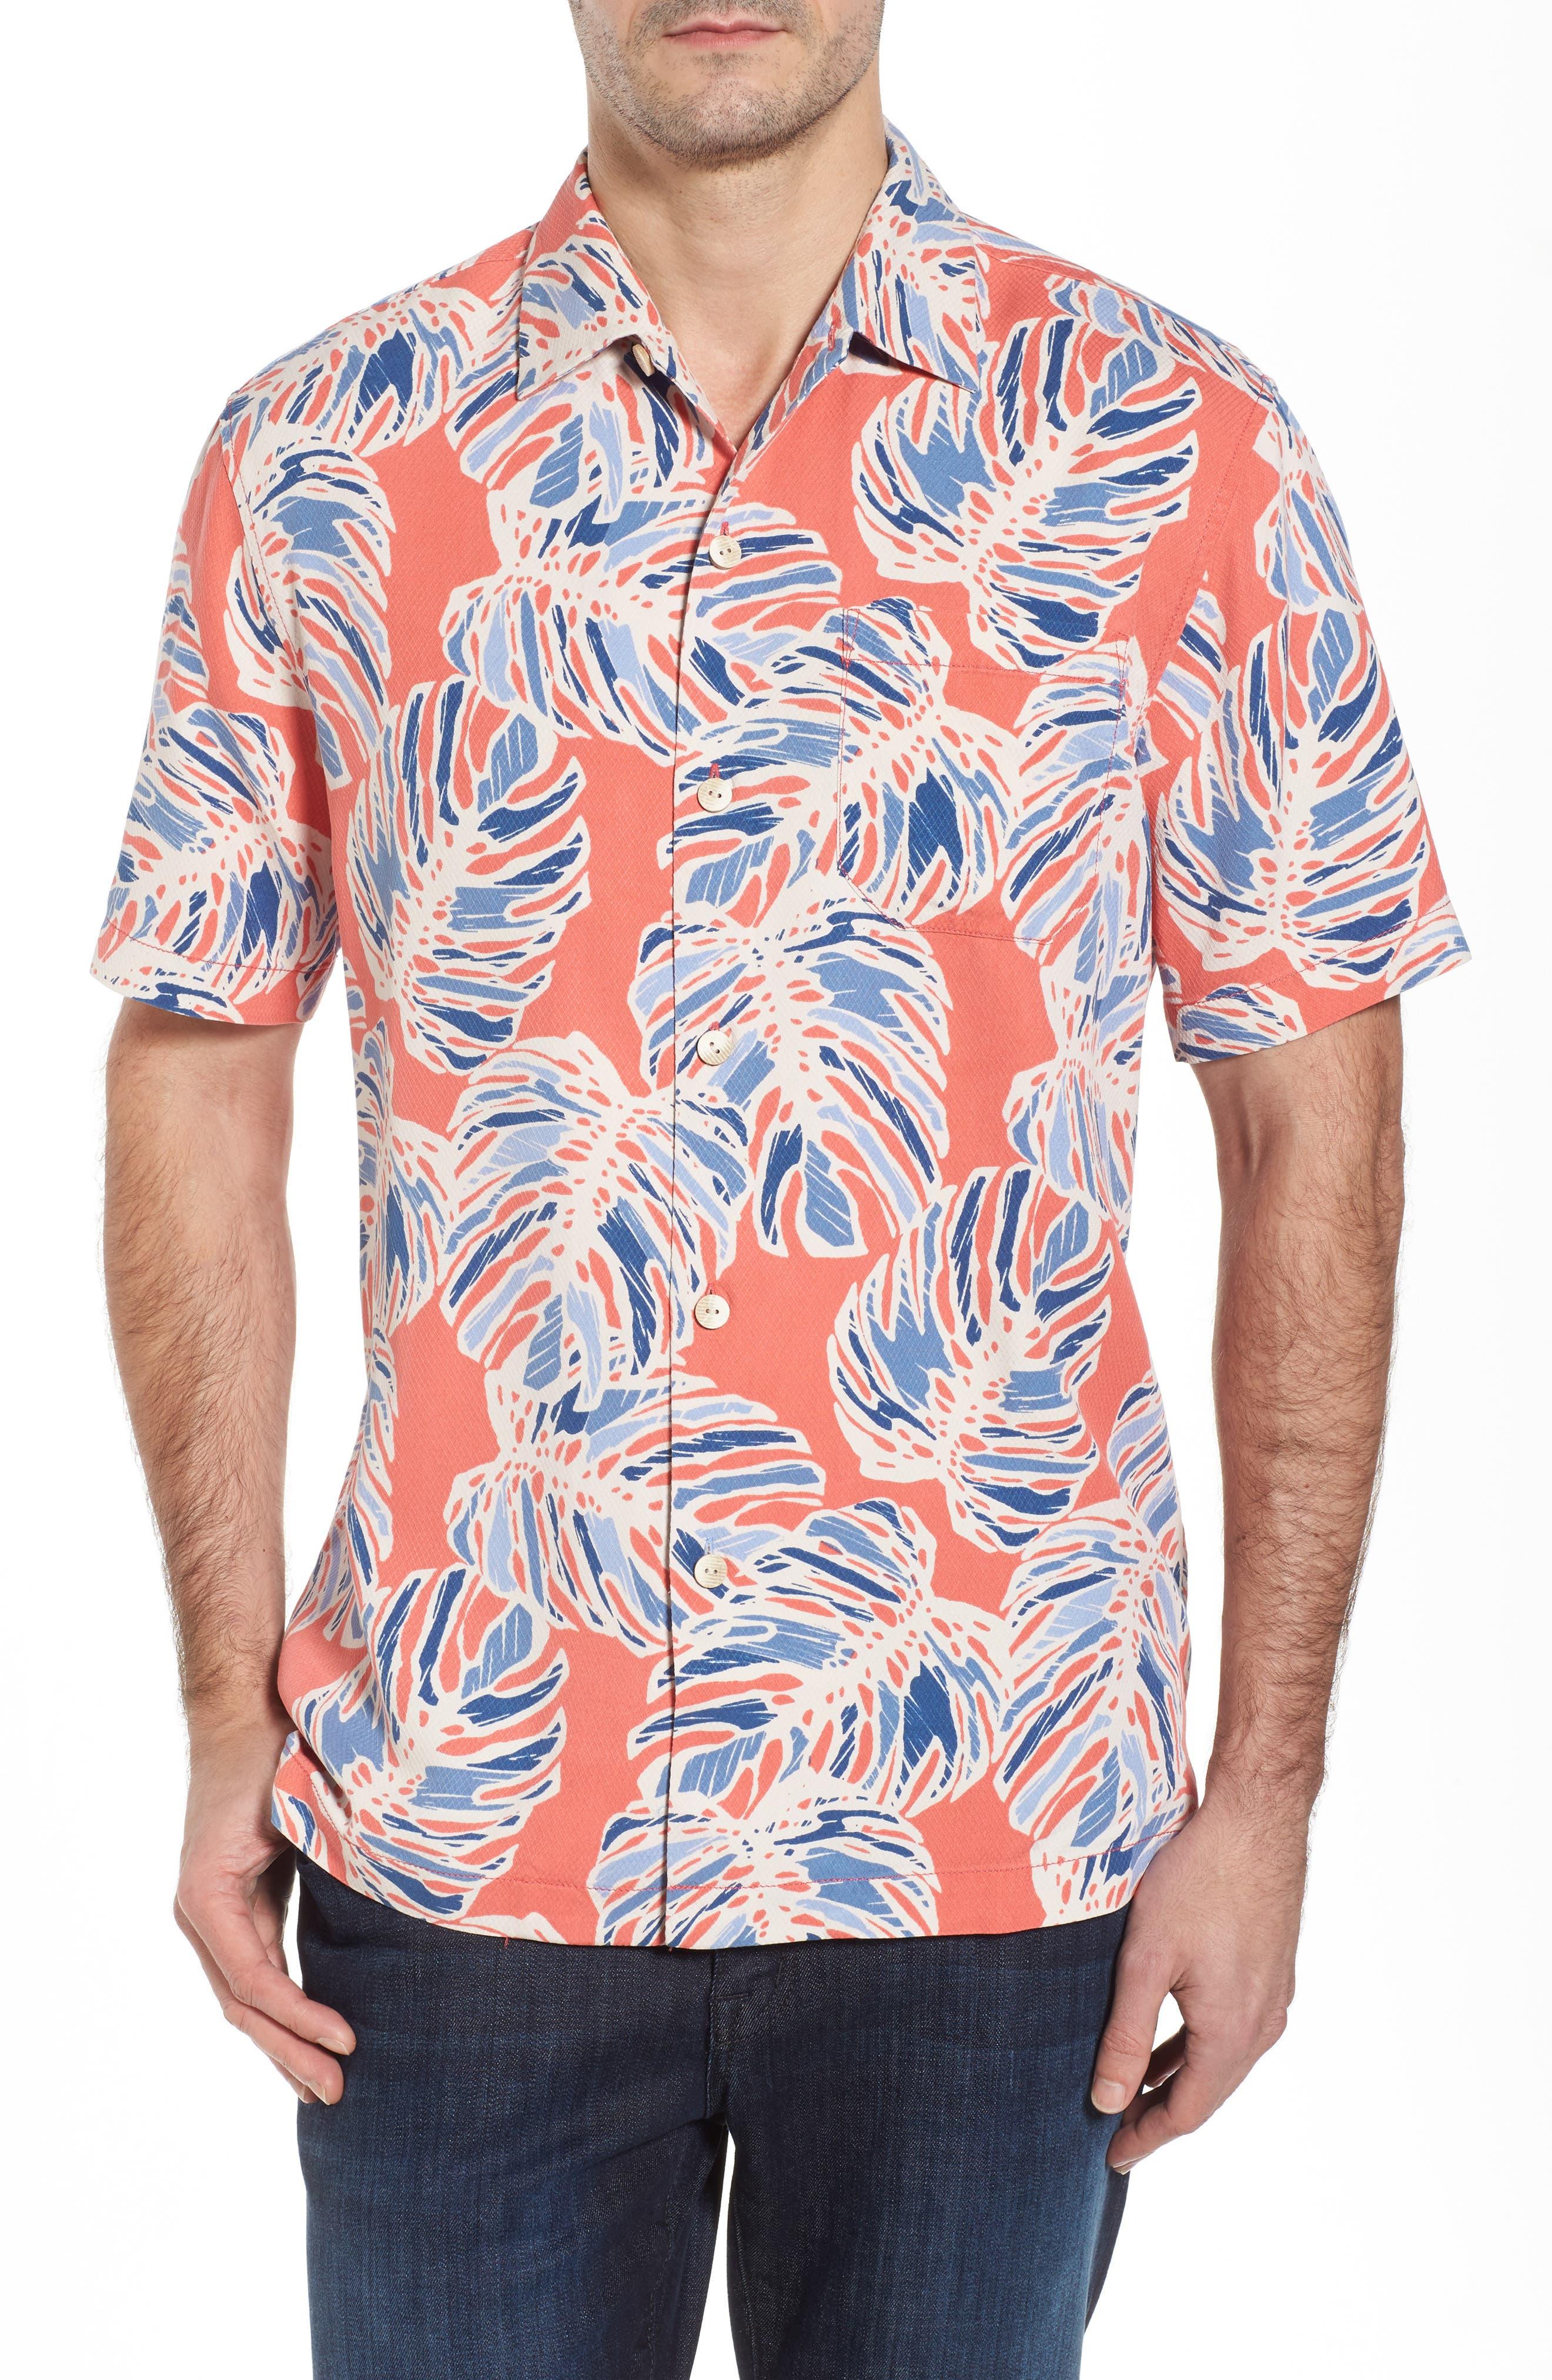 Main Image - Tommy Bahama Leaf It to Chance Silk Camp Shirt